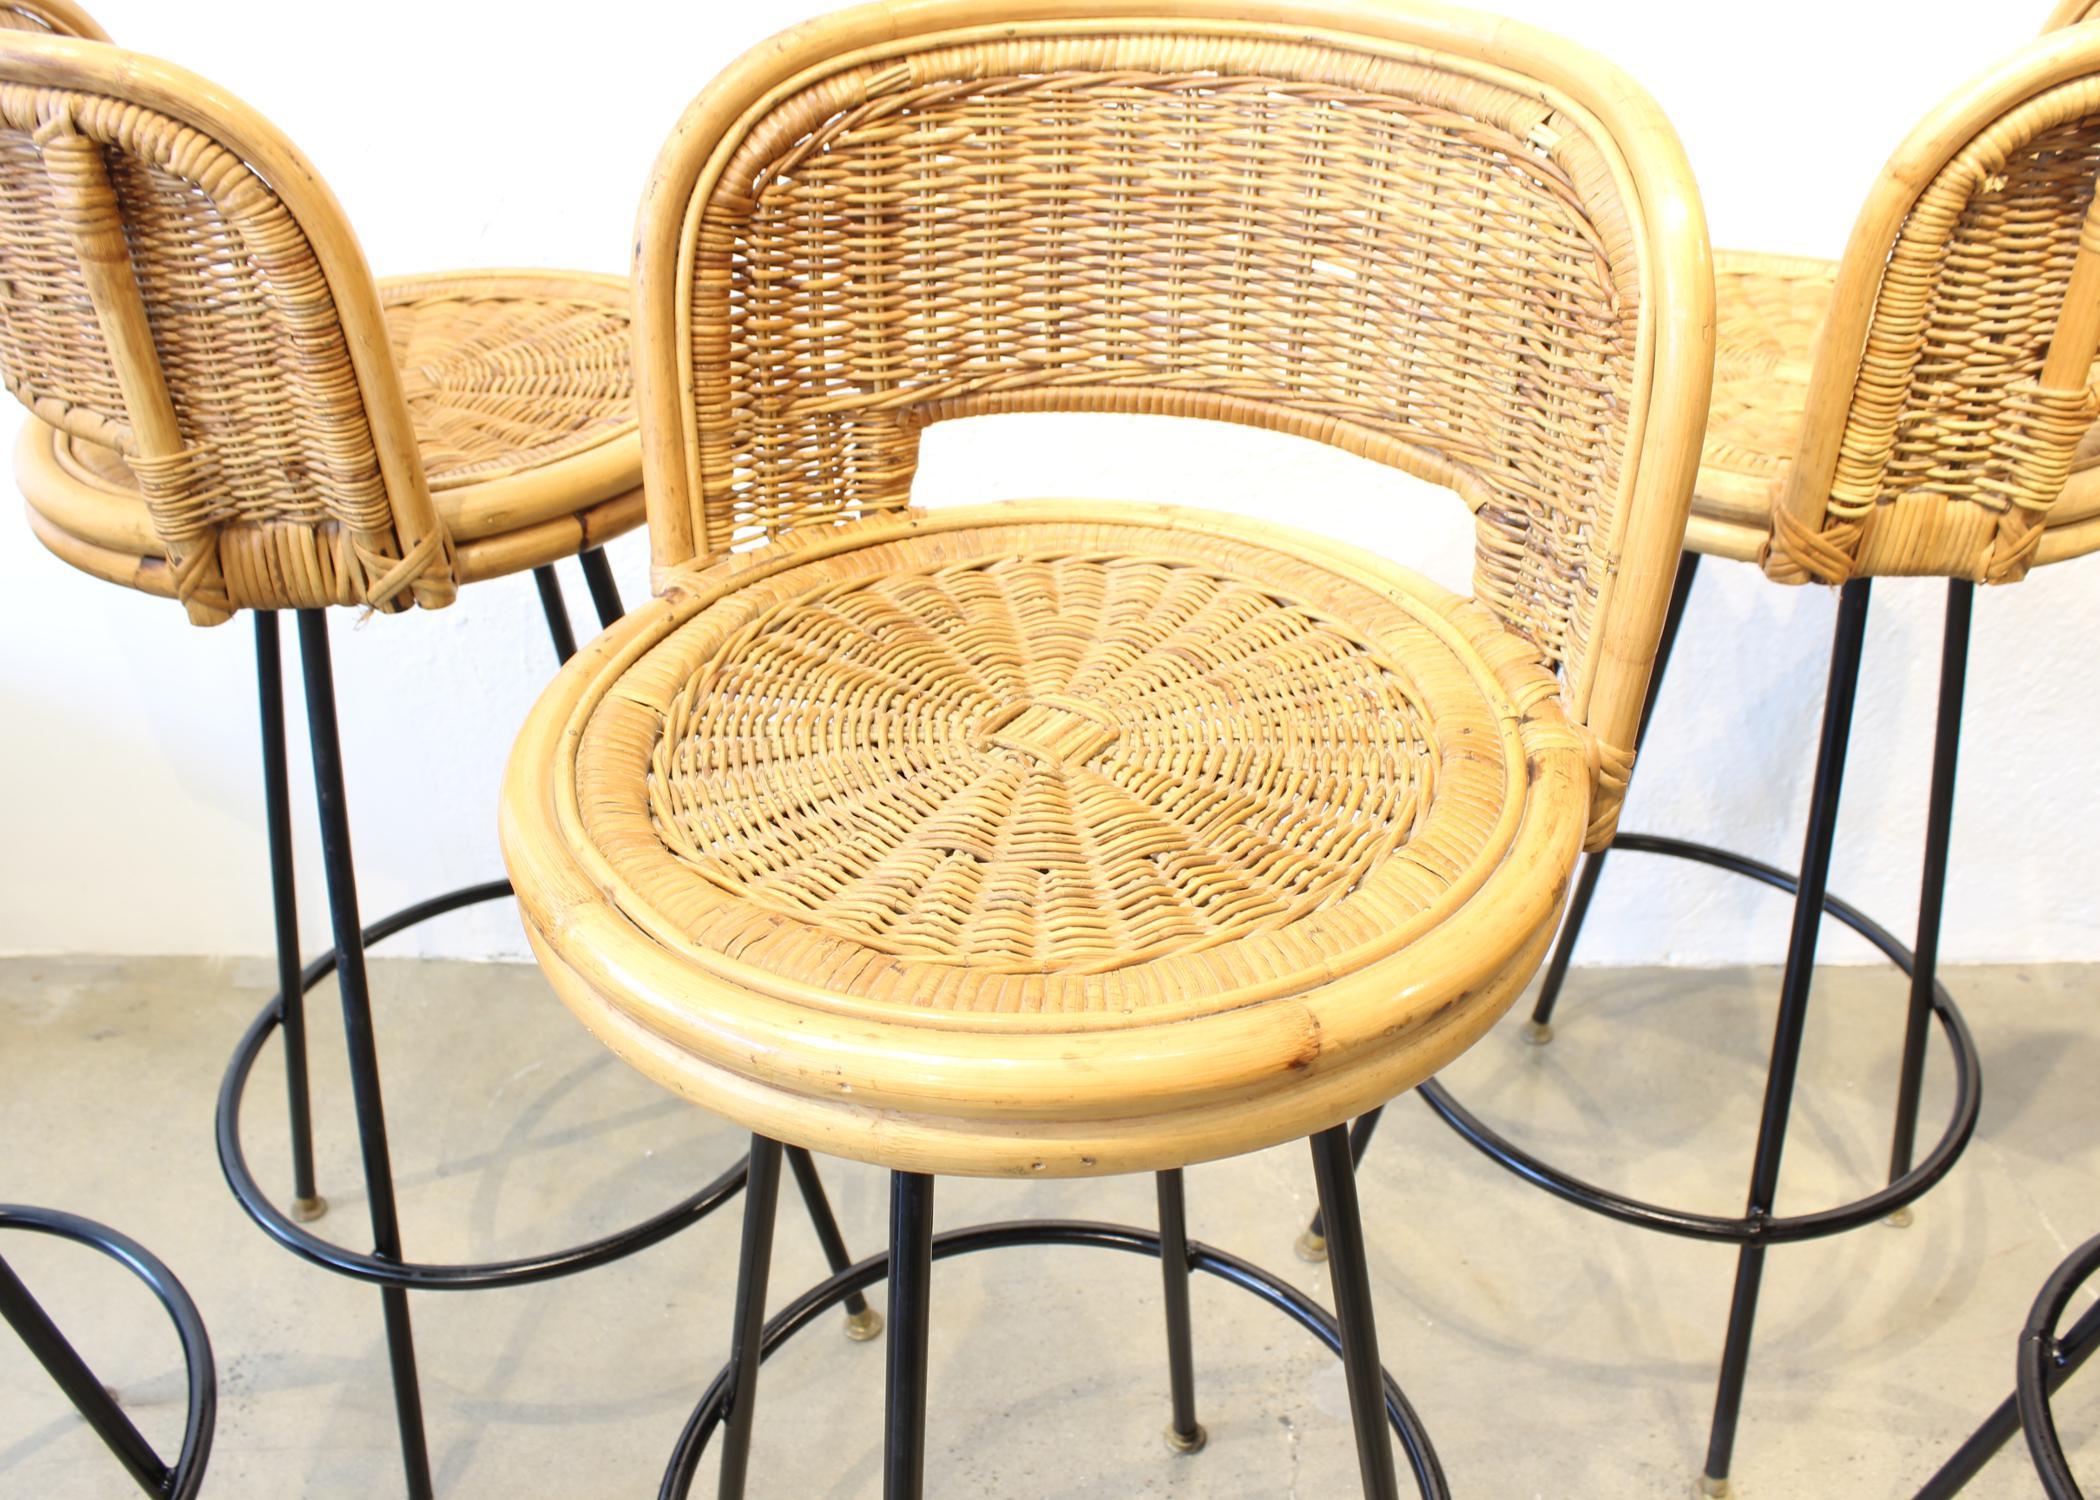 image of rattan u0026 wrought iron bar stools set - Wrought Iron Bar Stools